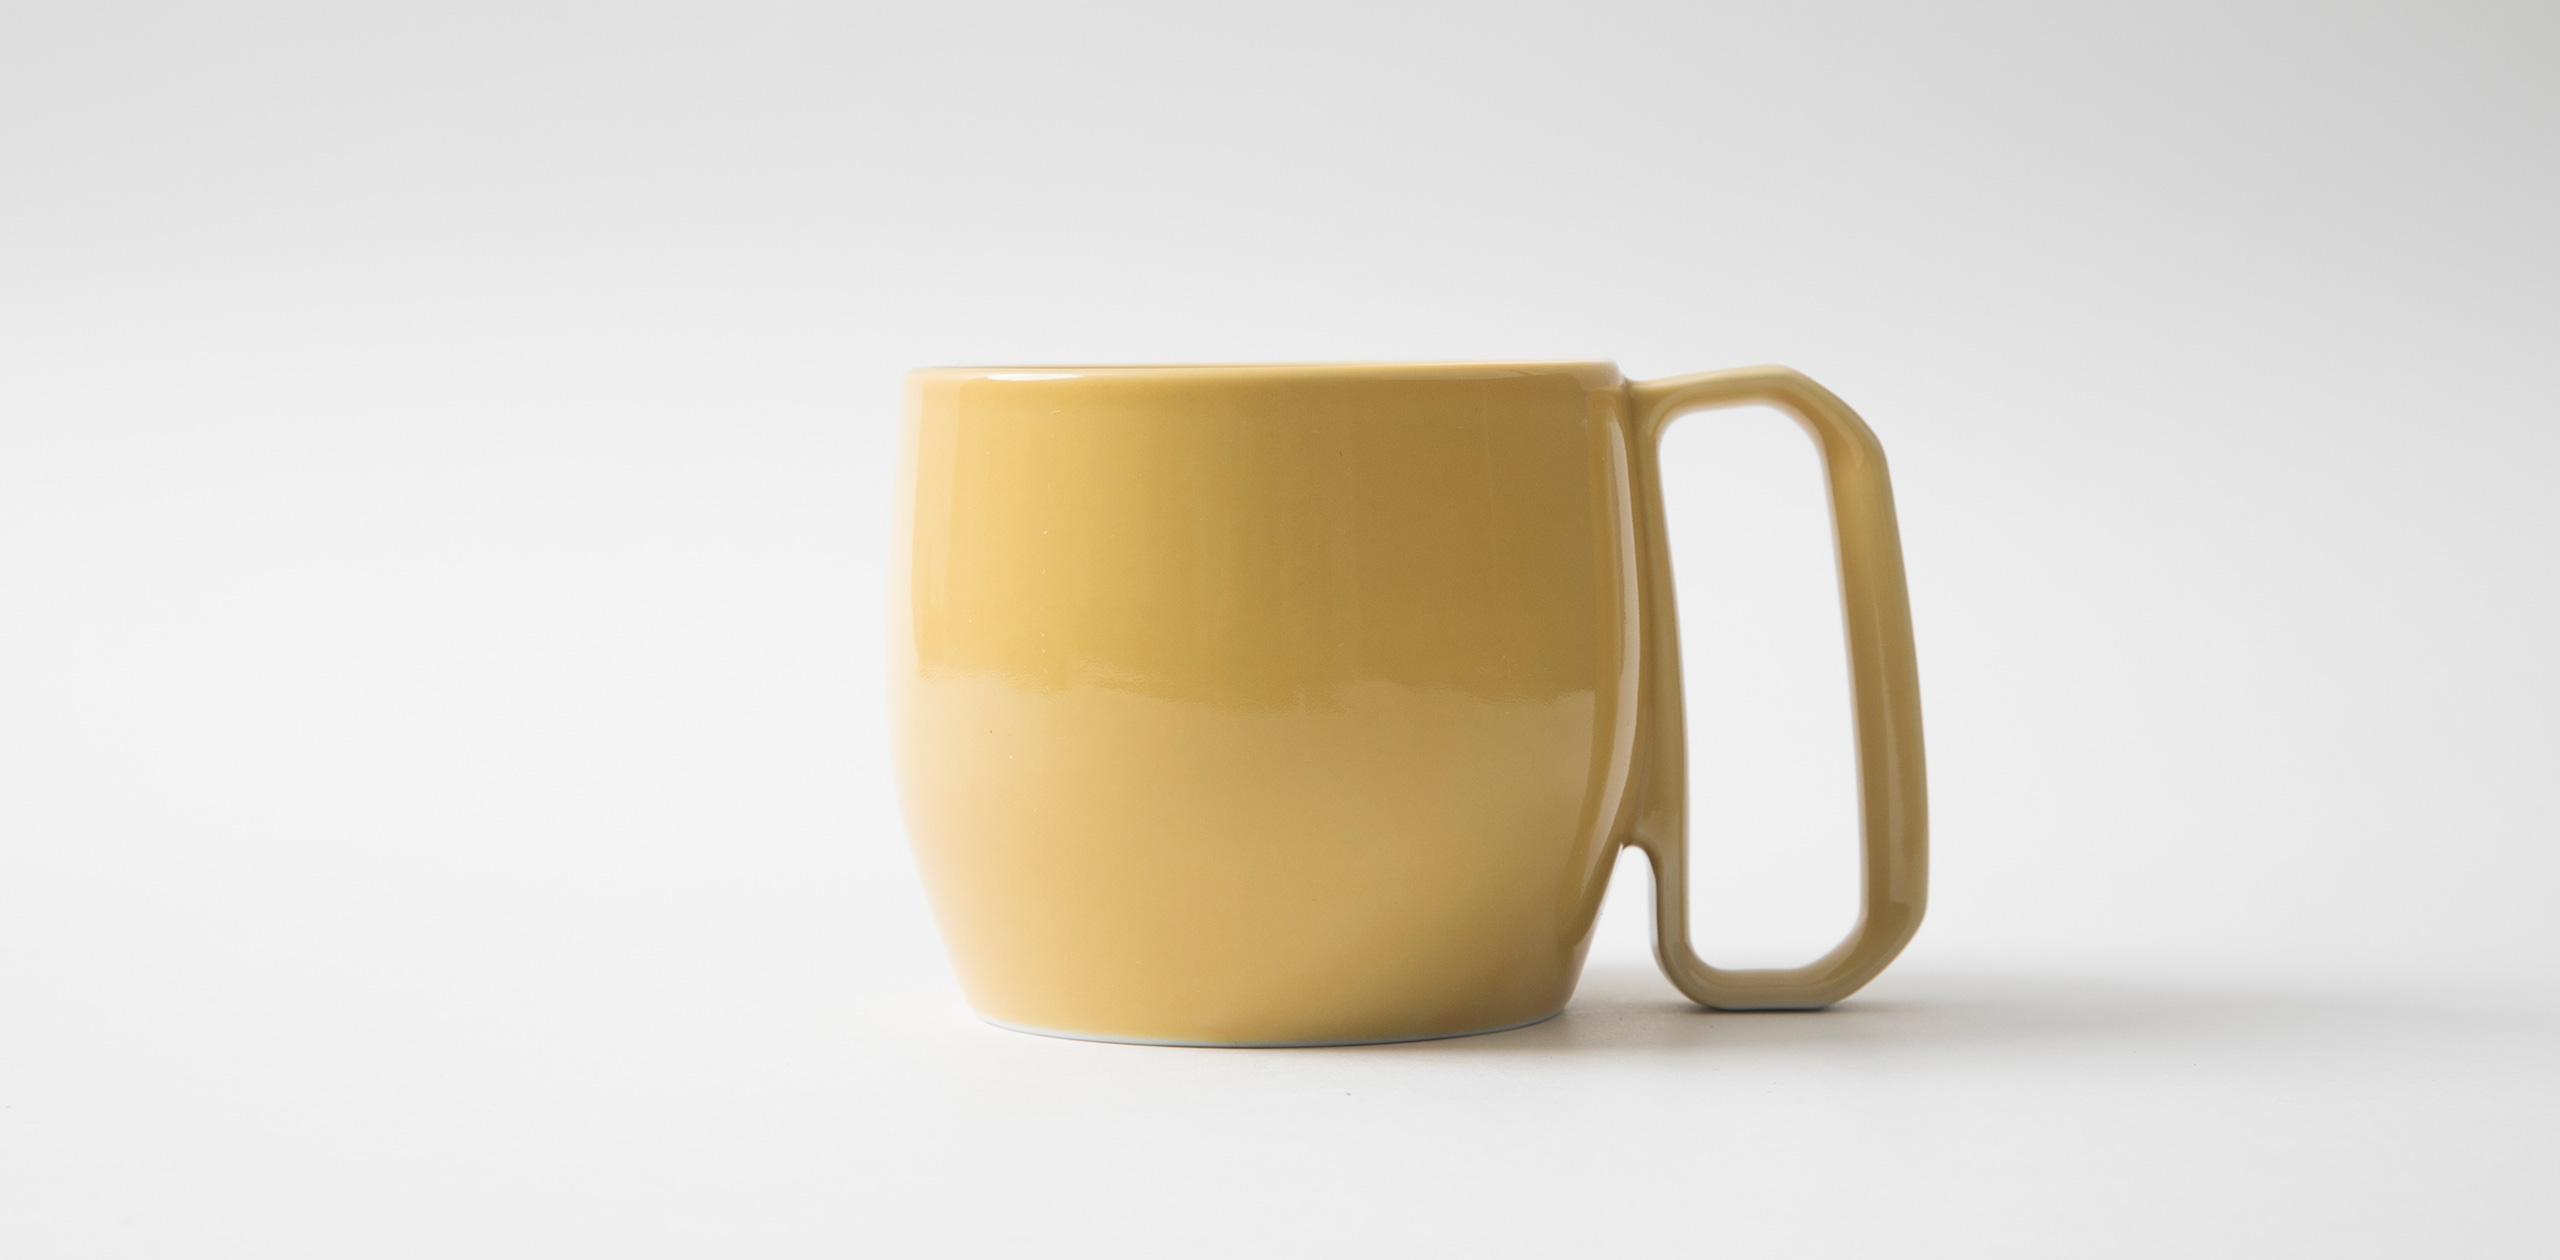 motteマグカップ2